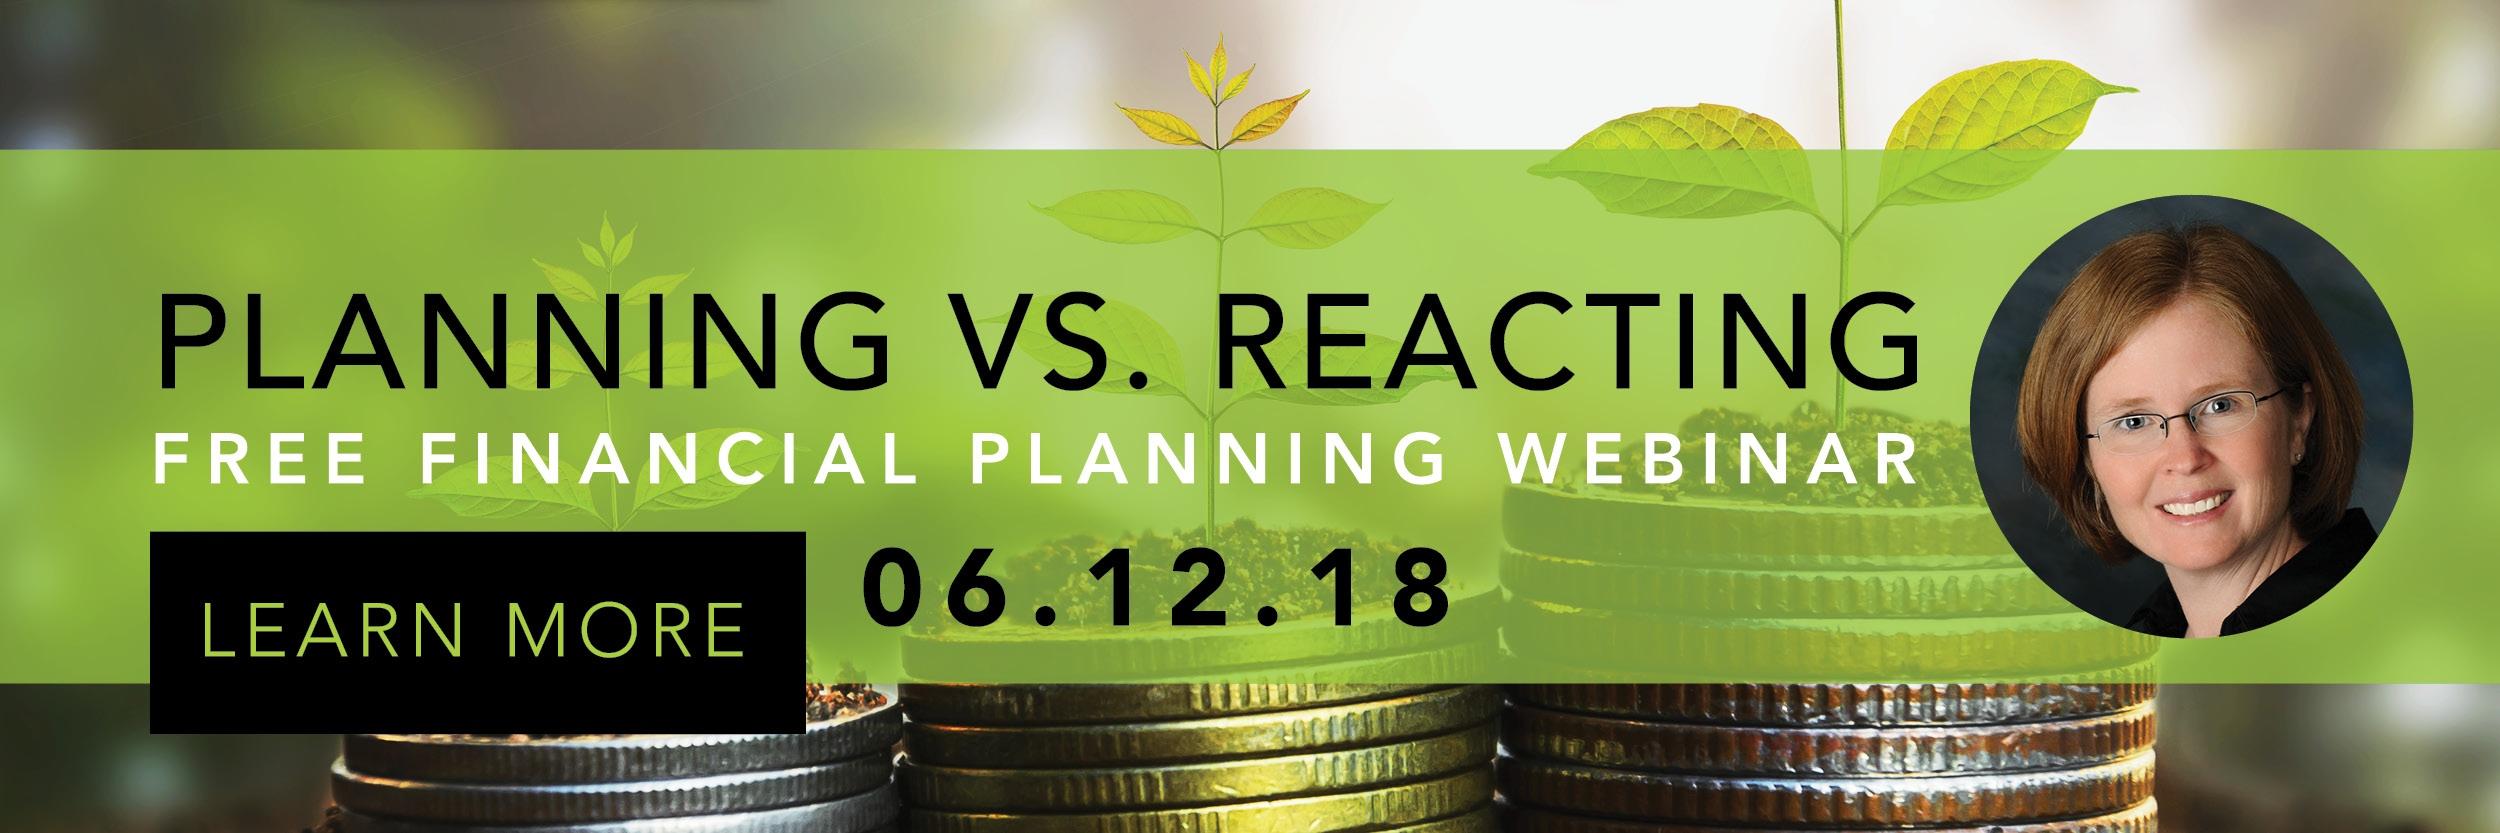 Financial Planning Webinar June 12